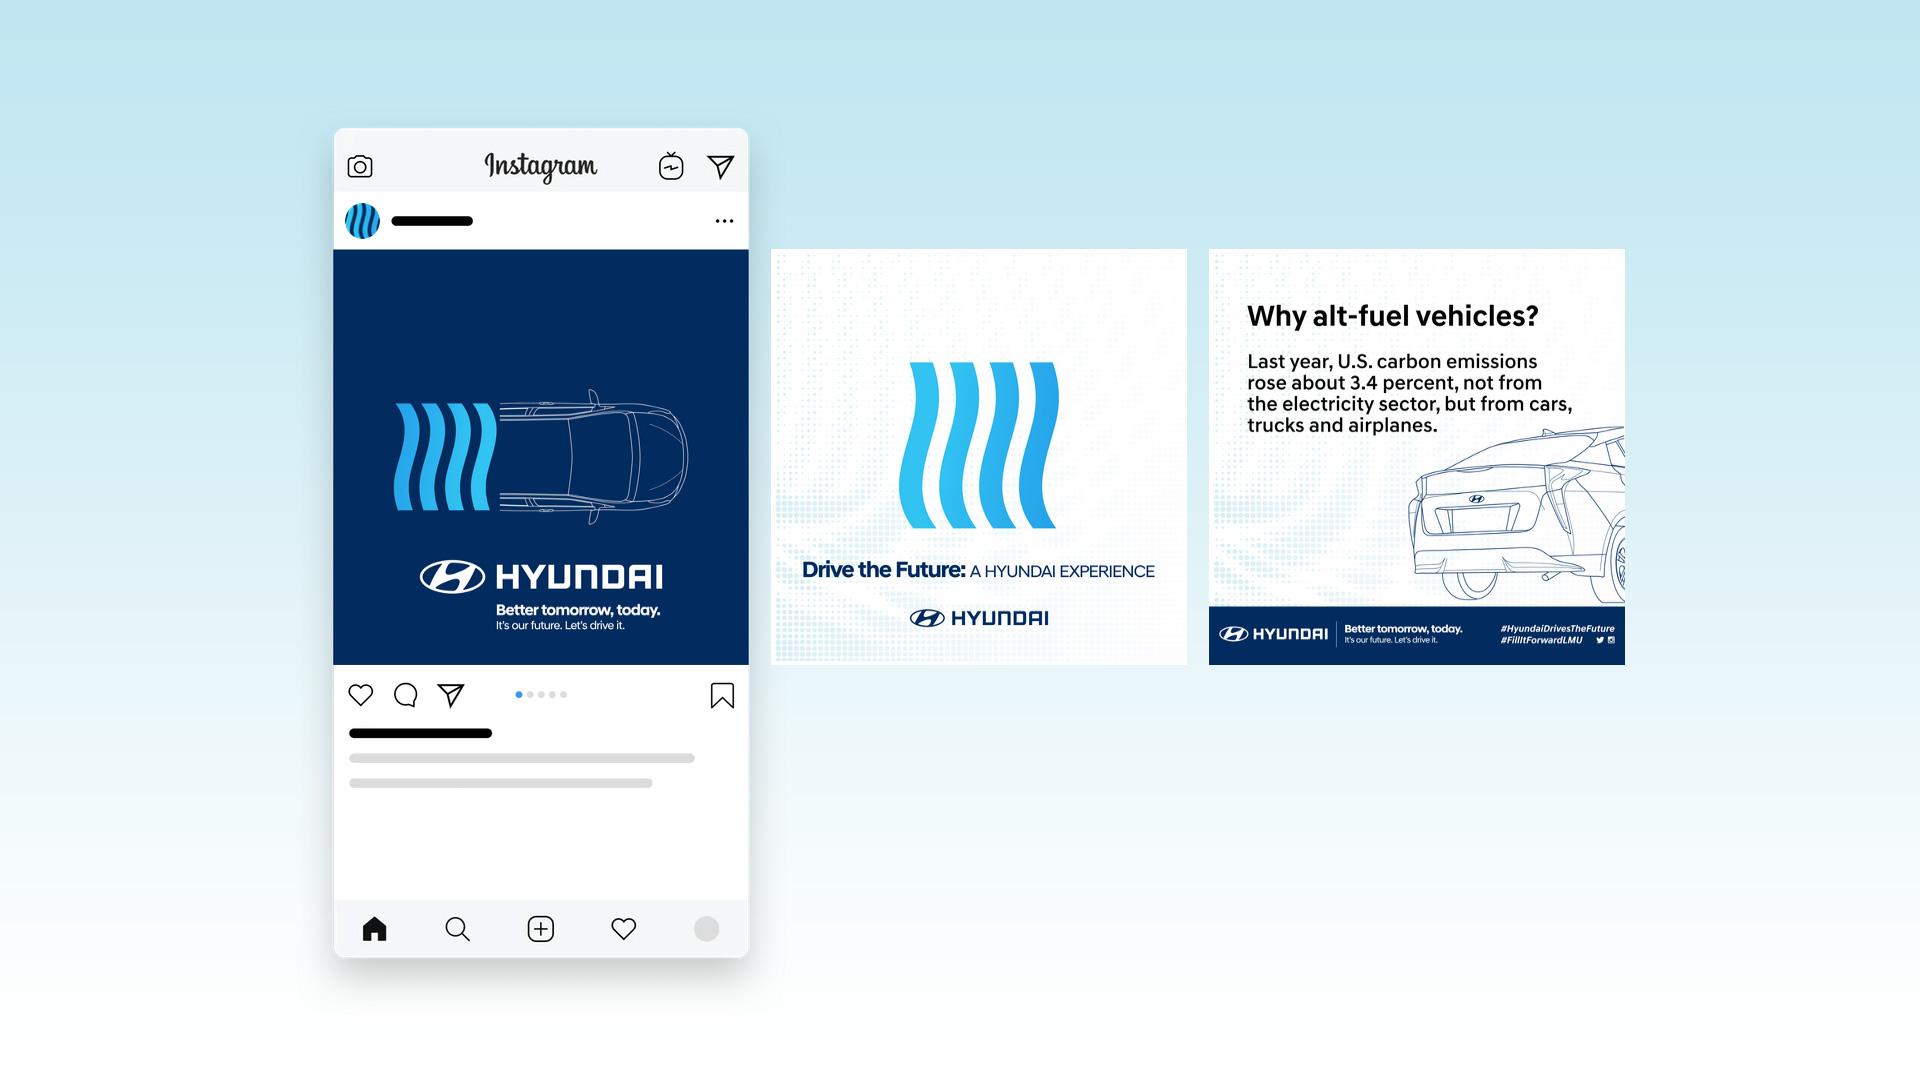 Hyundai Social Image